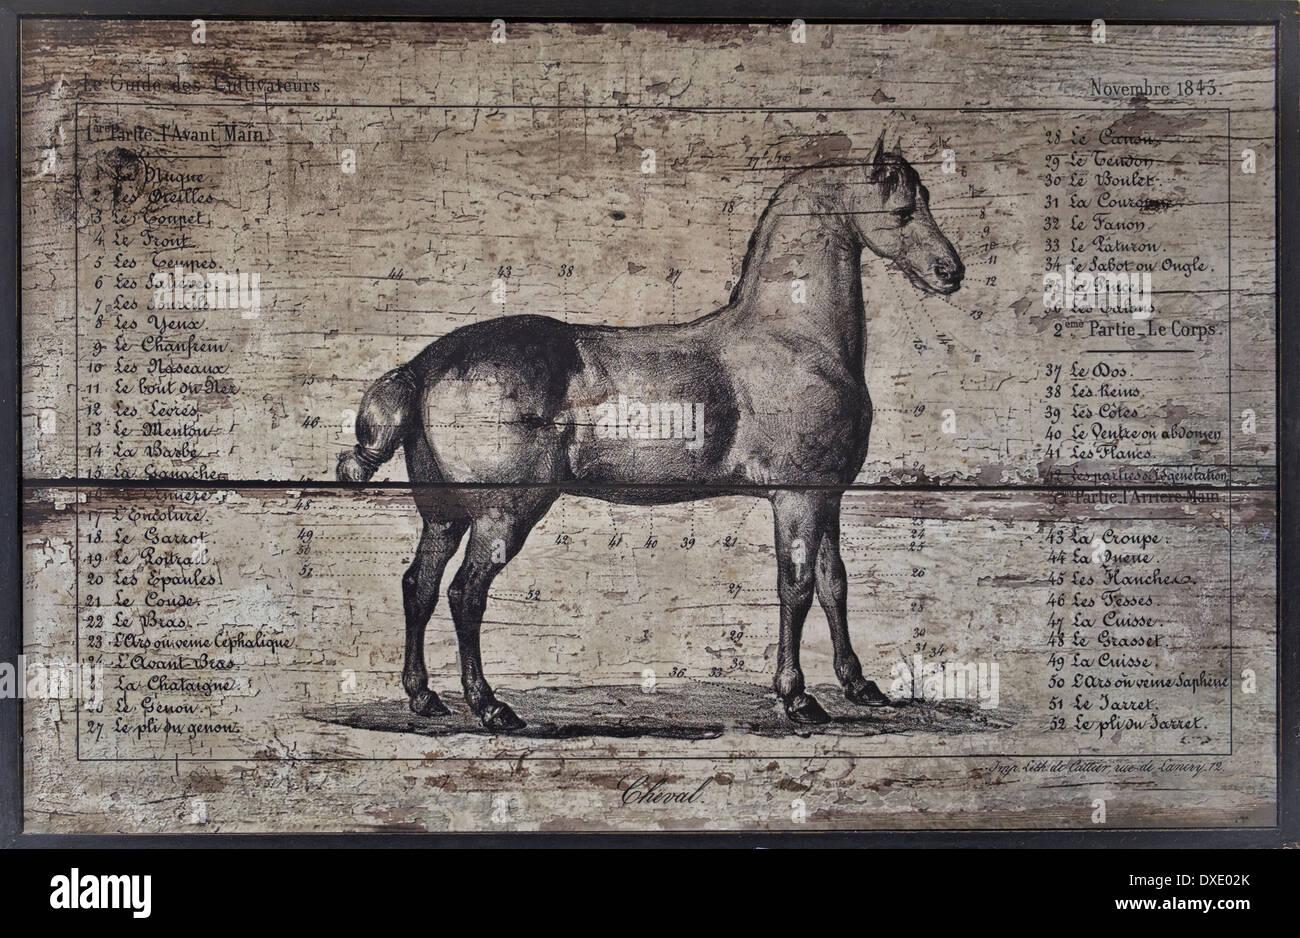 Horse Anatomy Stock Photos & Horse Anatomy Stock Images - Alamy